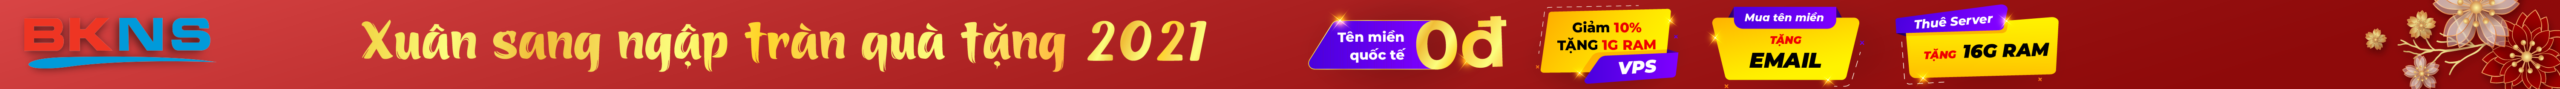 web-bkns-02